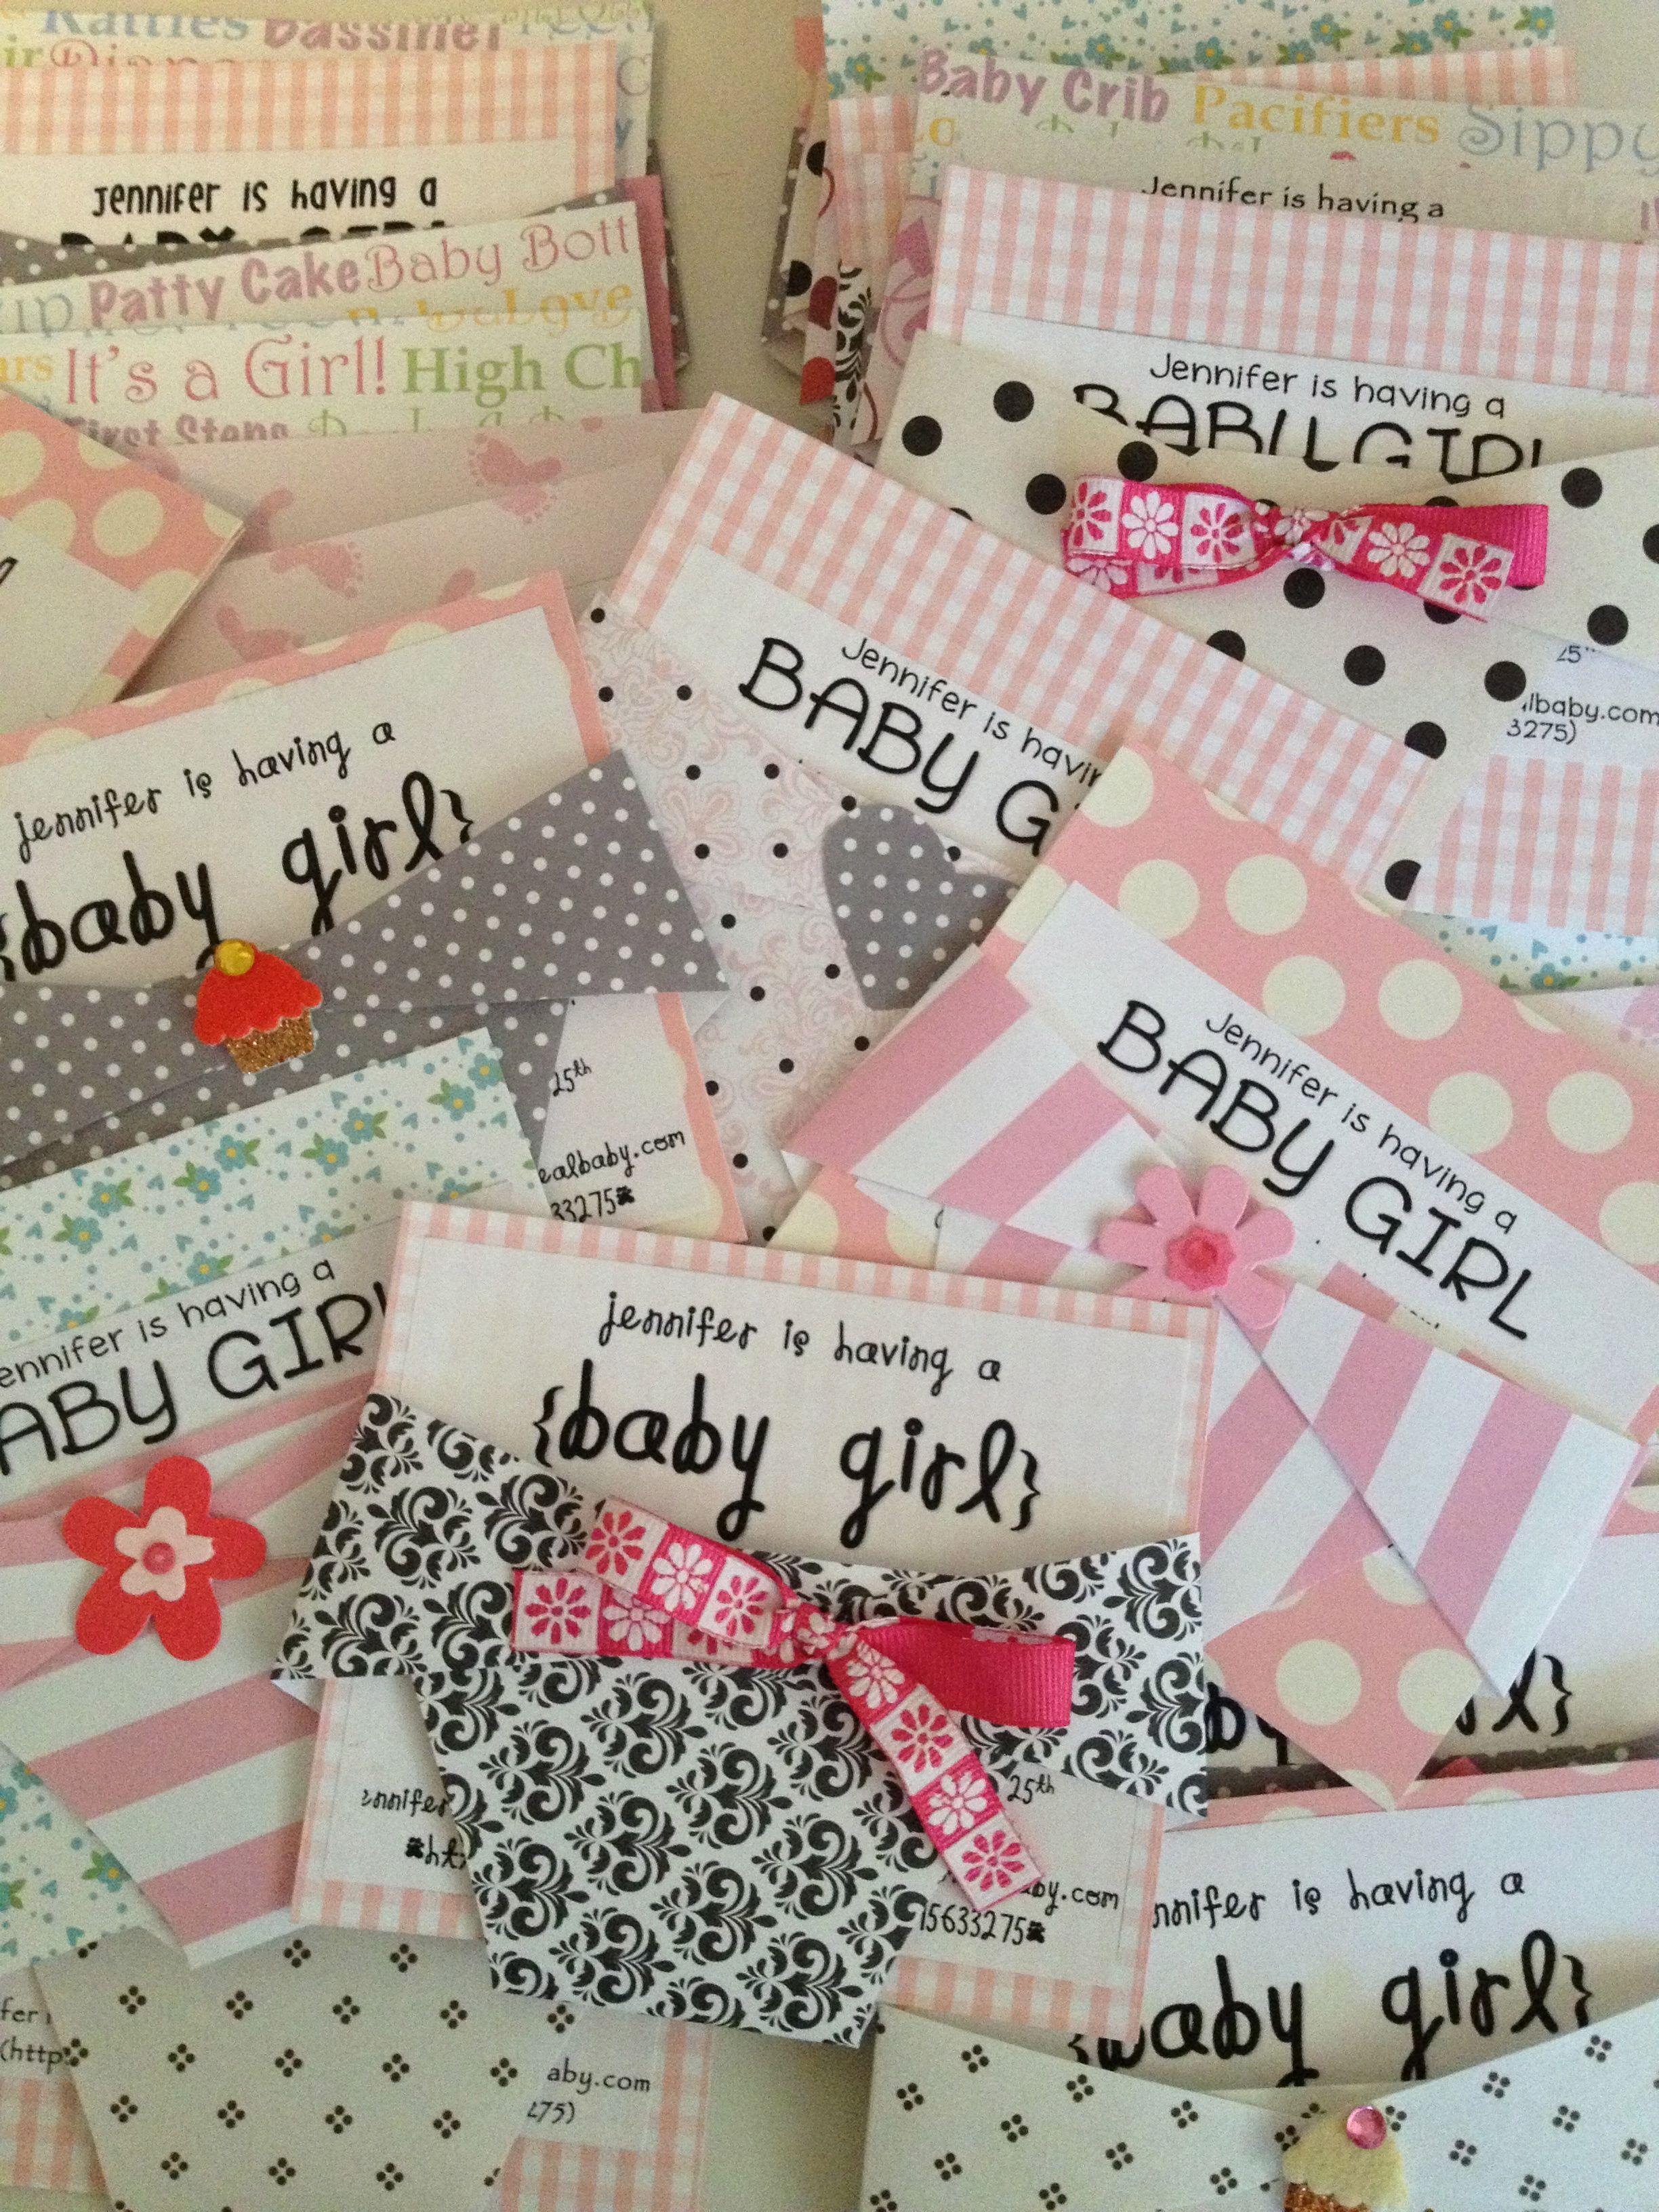 Diy Baby Shower Invites Such A Cute Idea So Using It Next